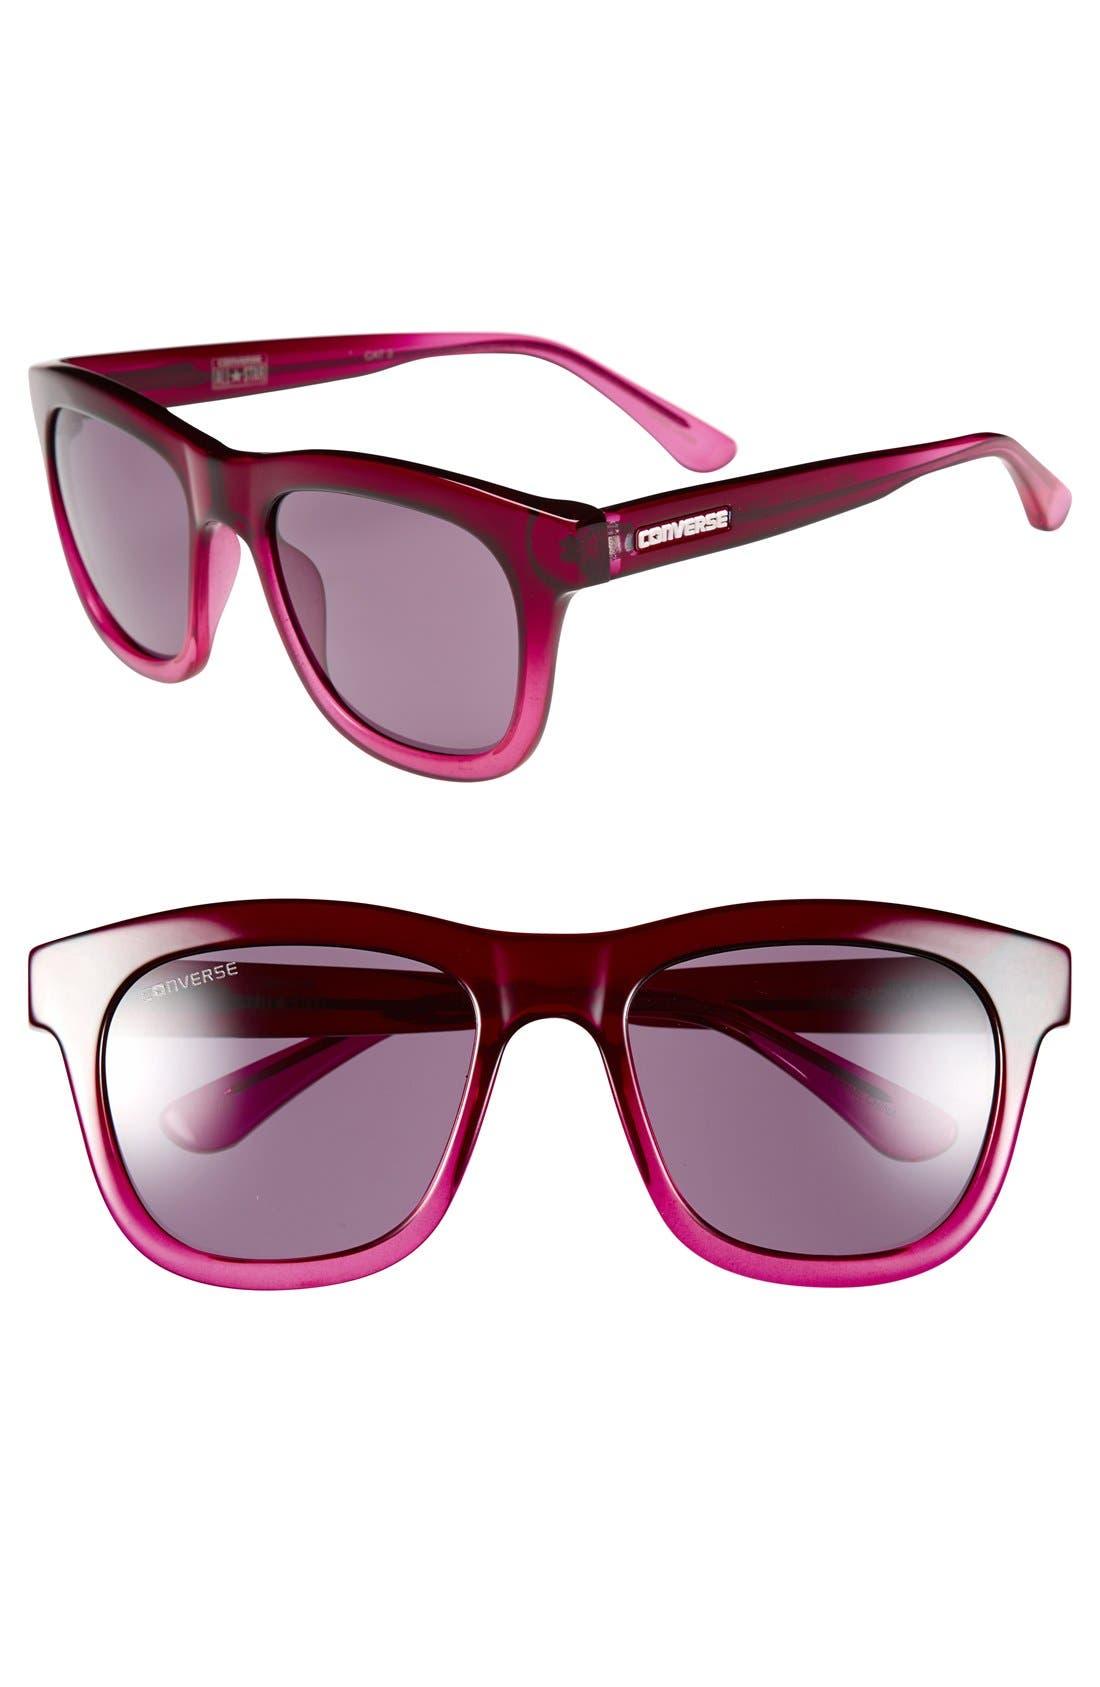 Main Image - Converse 54mm Retro Sunglasses